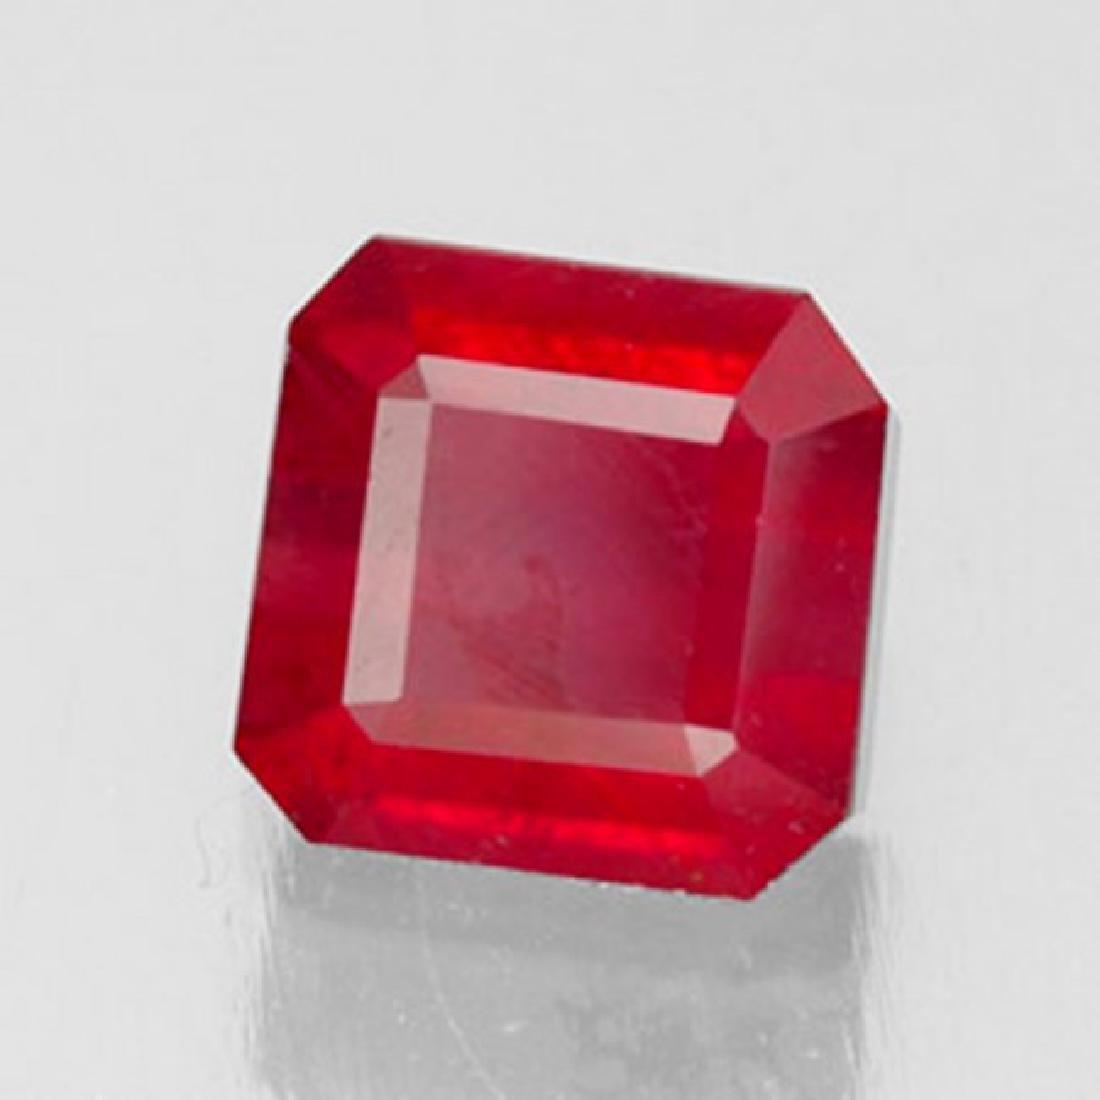 Natural Ruby Cushion Facet 1.72Ct 6.5x6.4x4.2mm